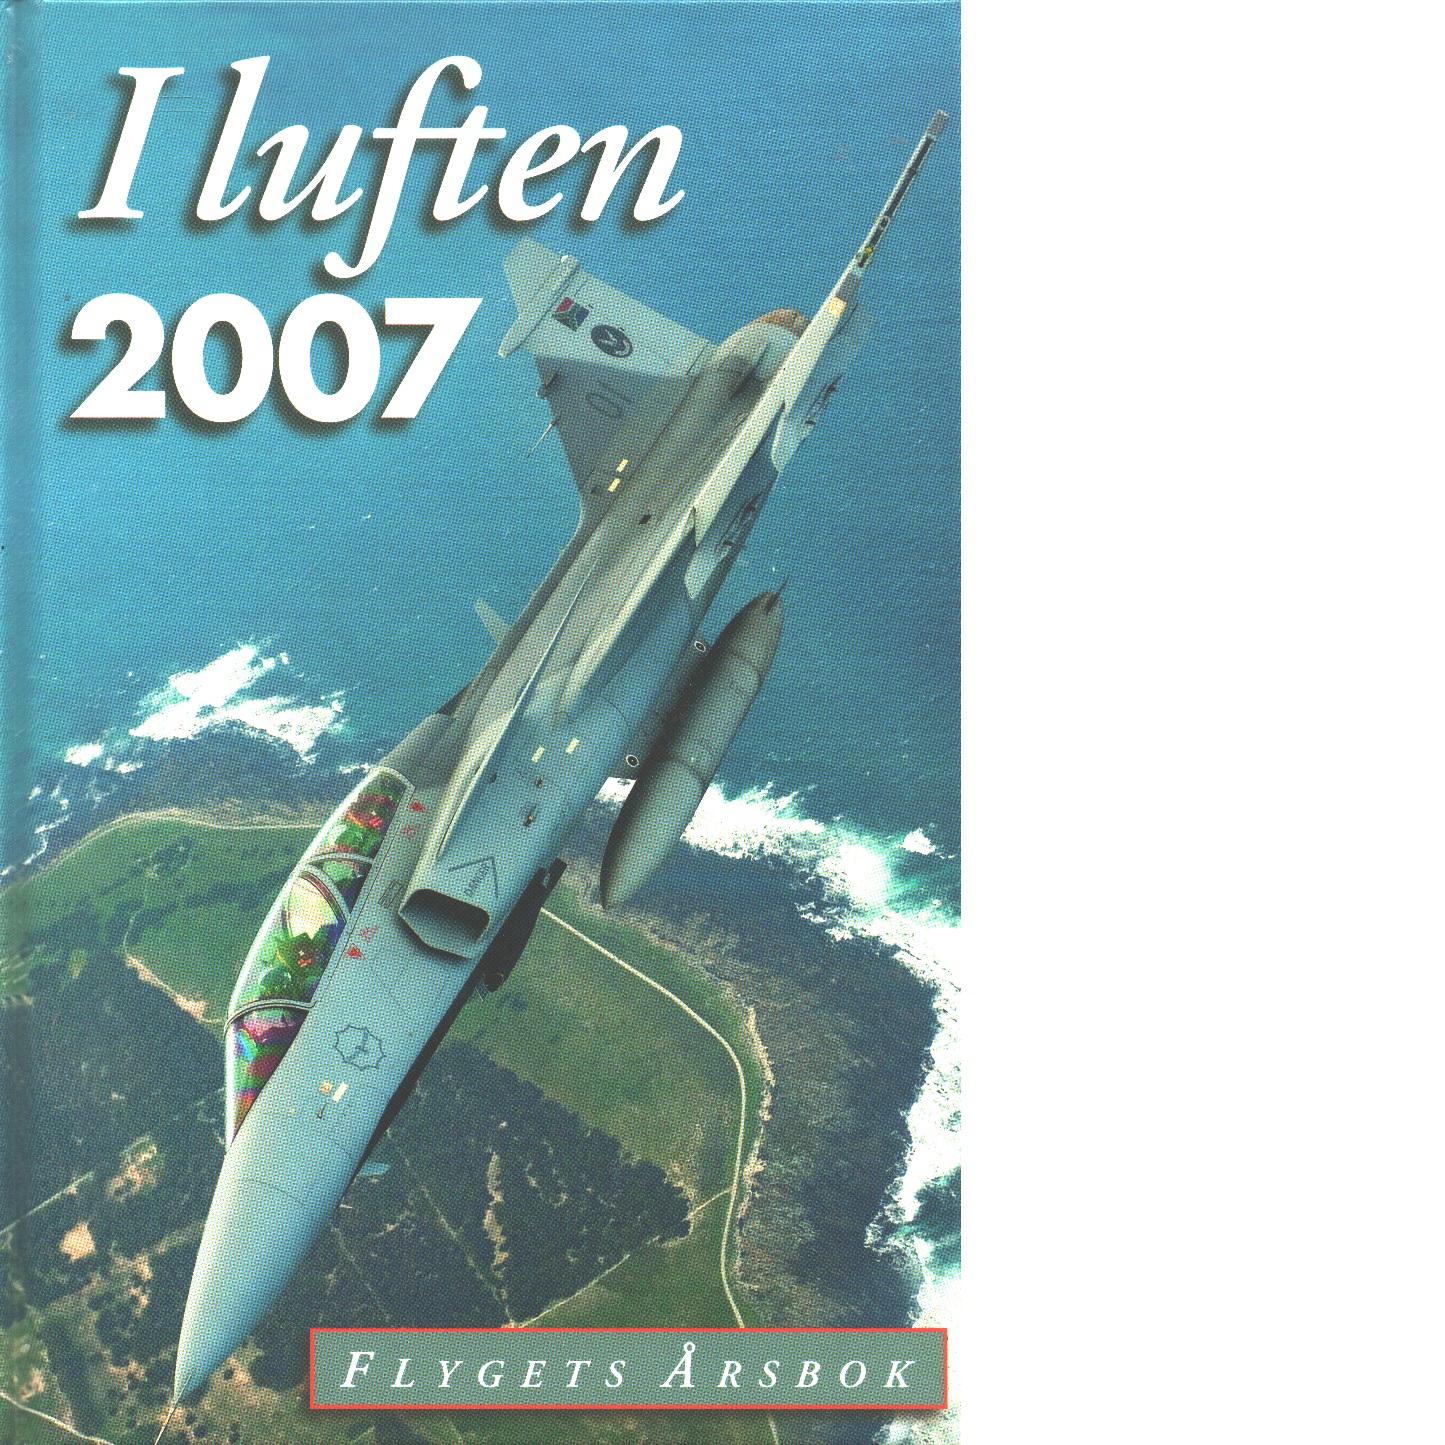 I LUFTEN FLYGETS ÅRSBOK 2007 - KRISTOFFERSSON, PEJ